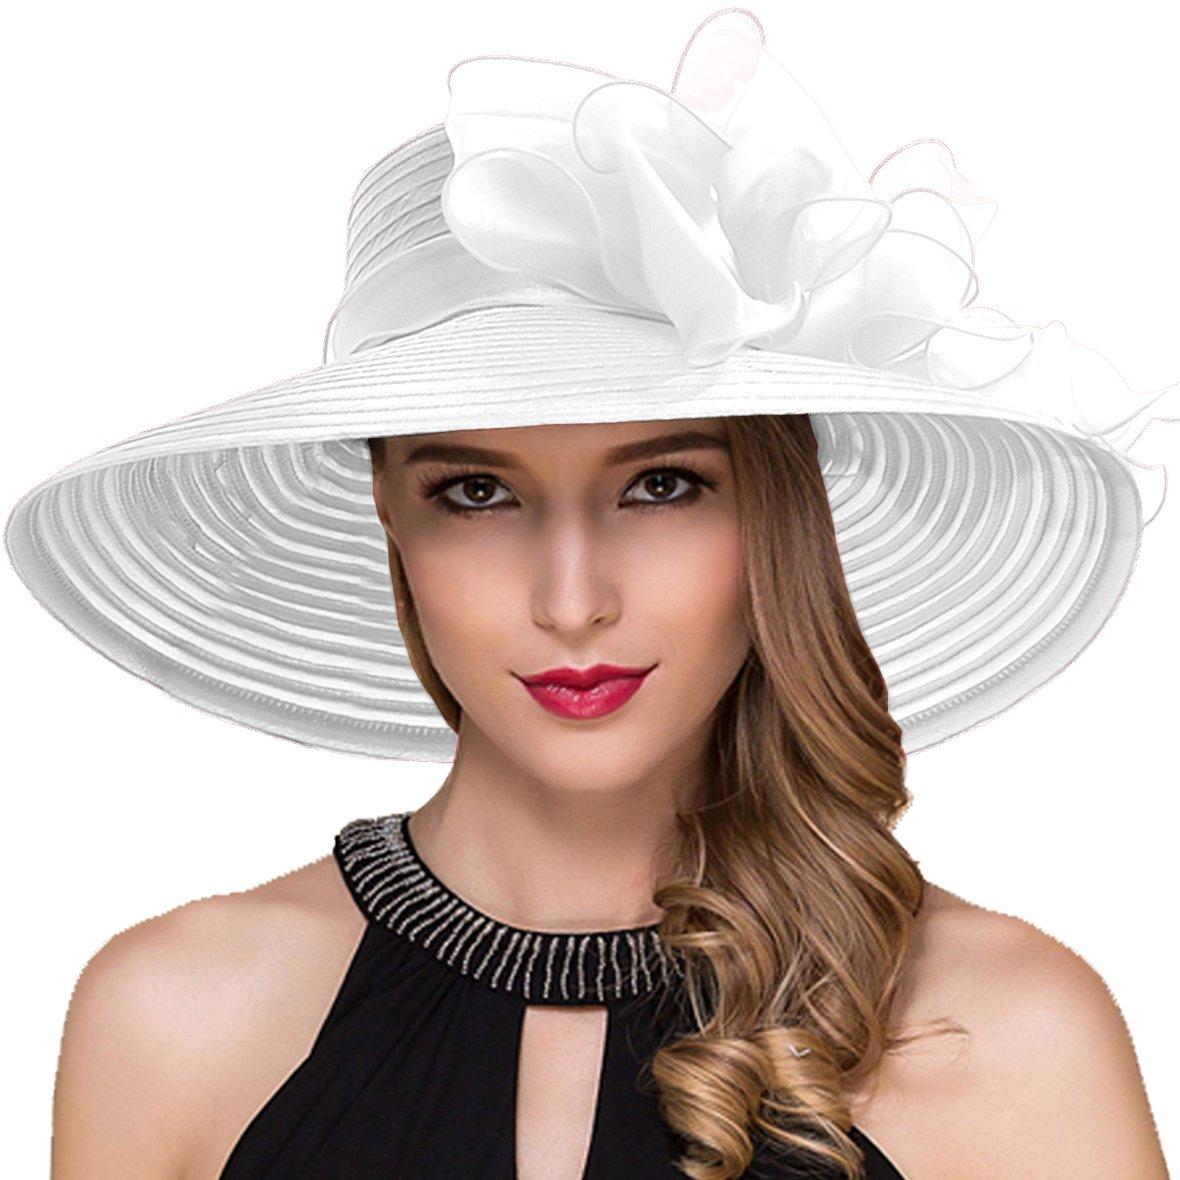 Women Kentucky Derby Church Dress Cloche Hat Fascinator Floral Bucket Hat S052 (S062-White)